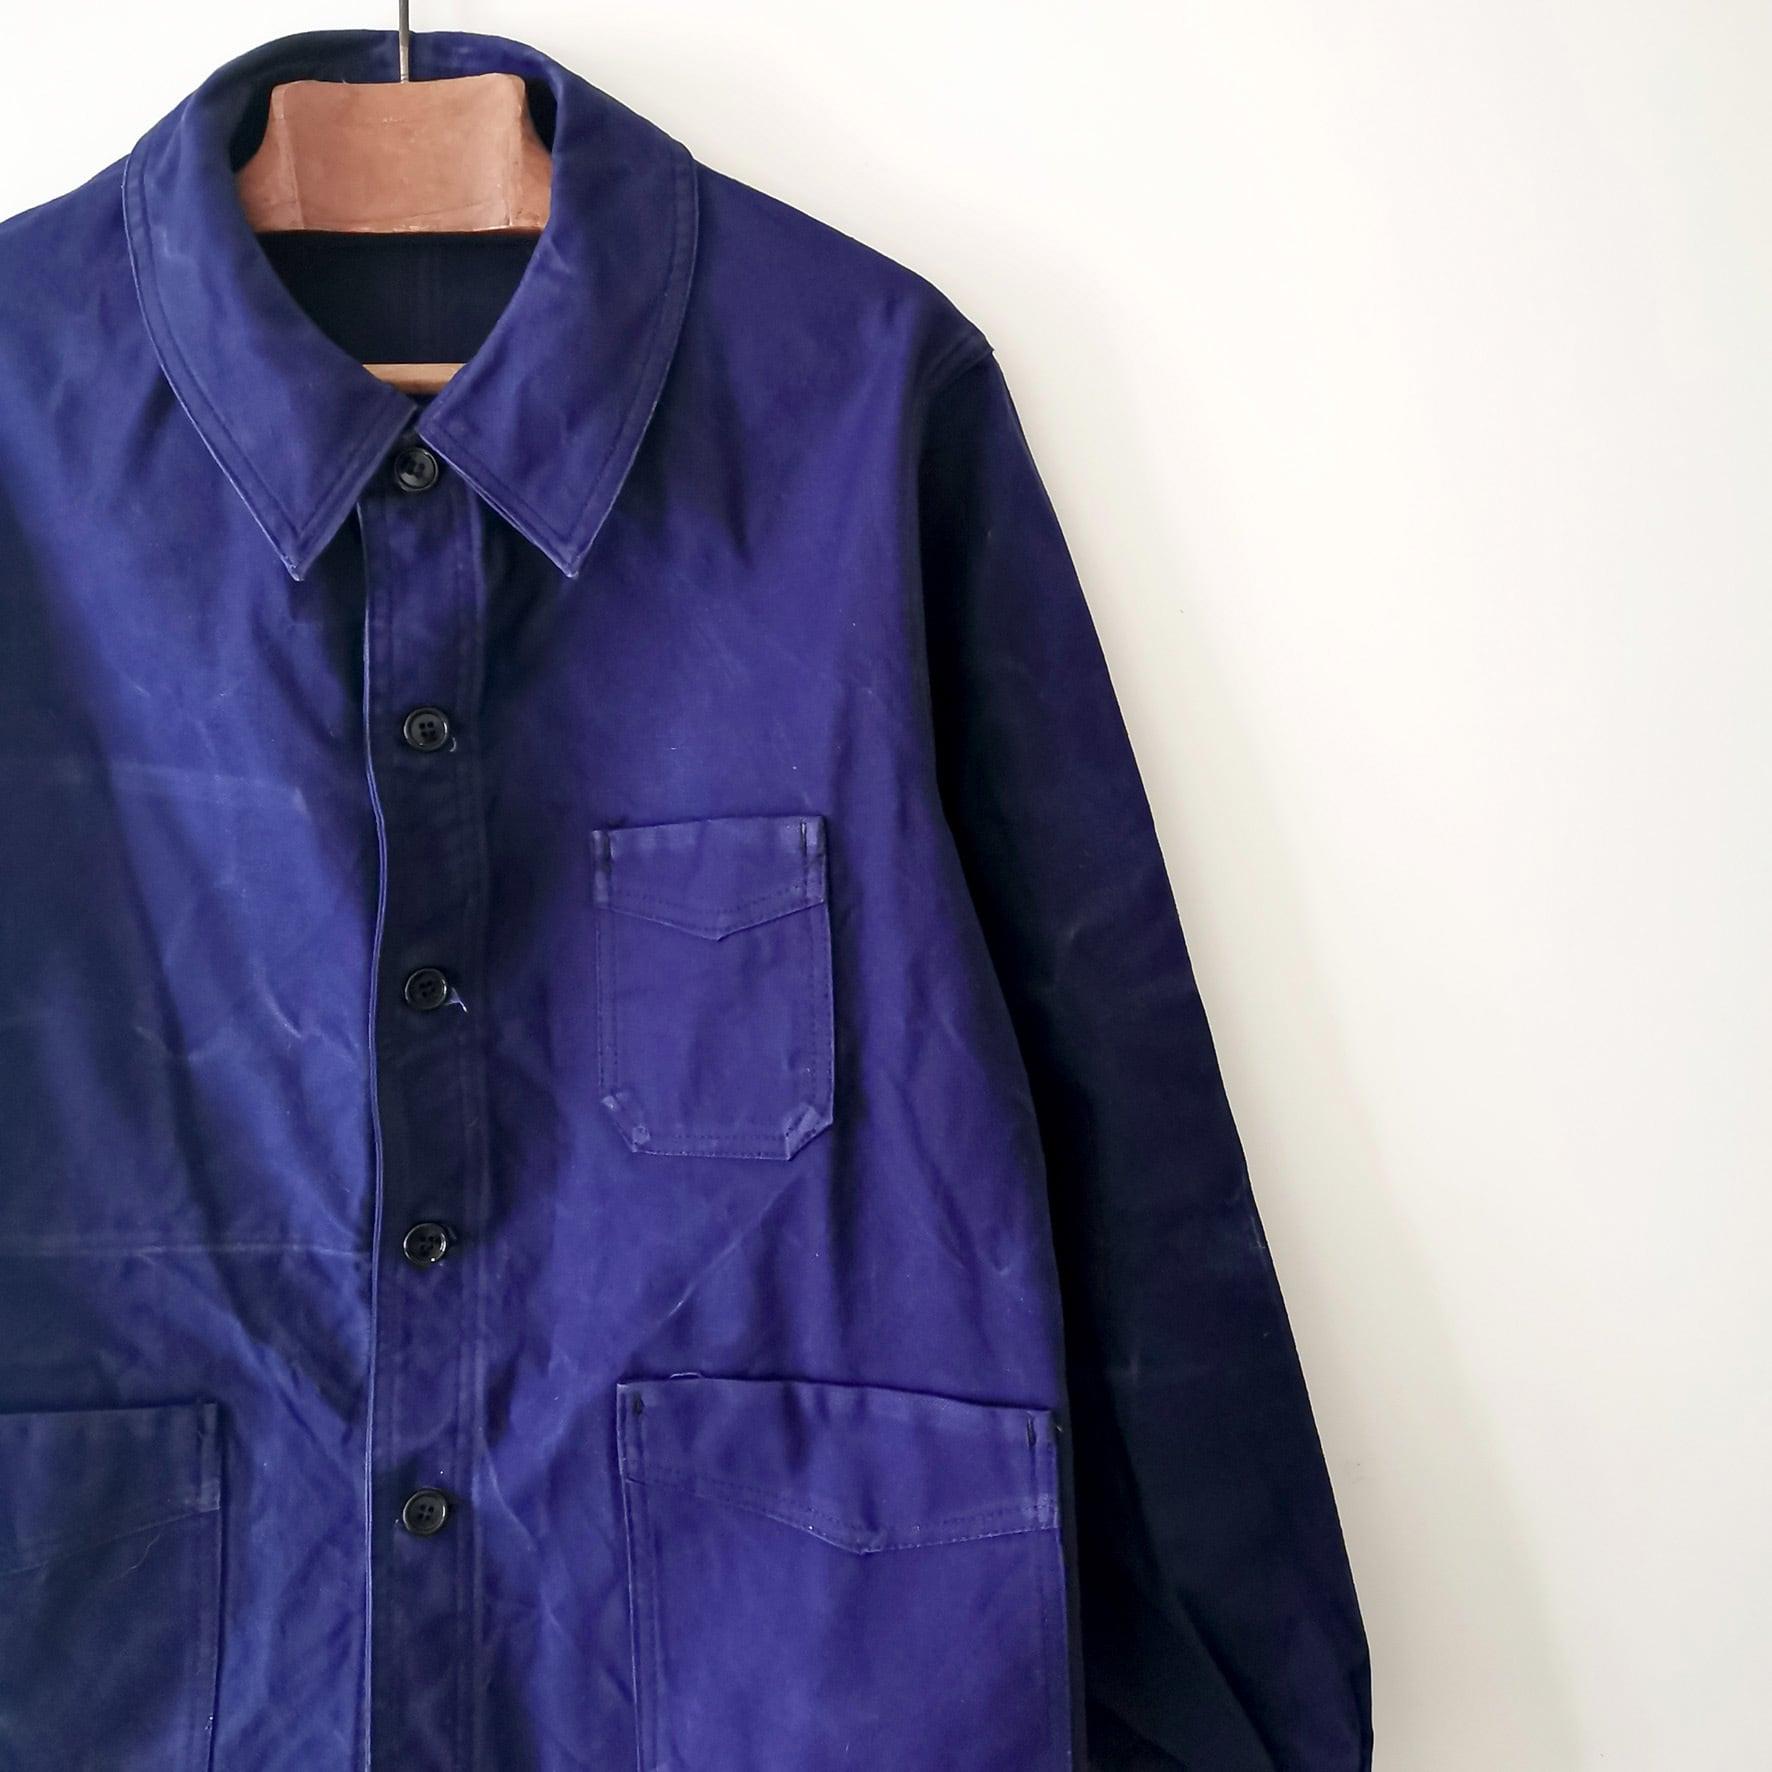 【MADE IN FRANCE】【DEADSTOCK】Vポケット ブルーワークジャケット